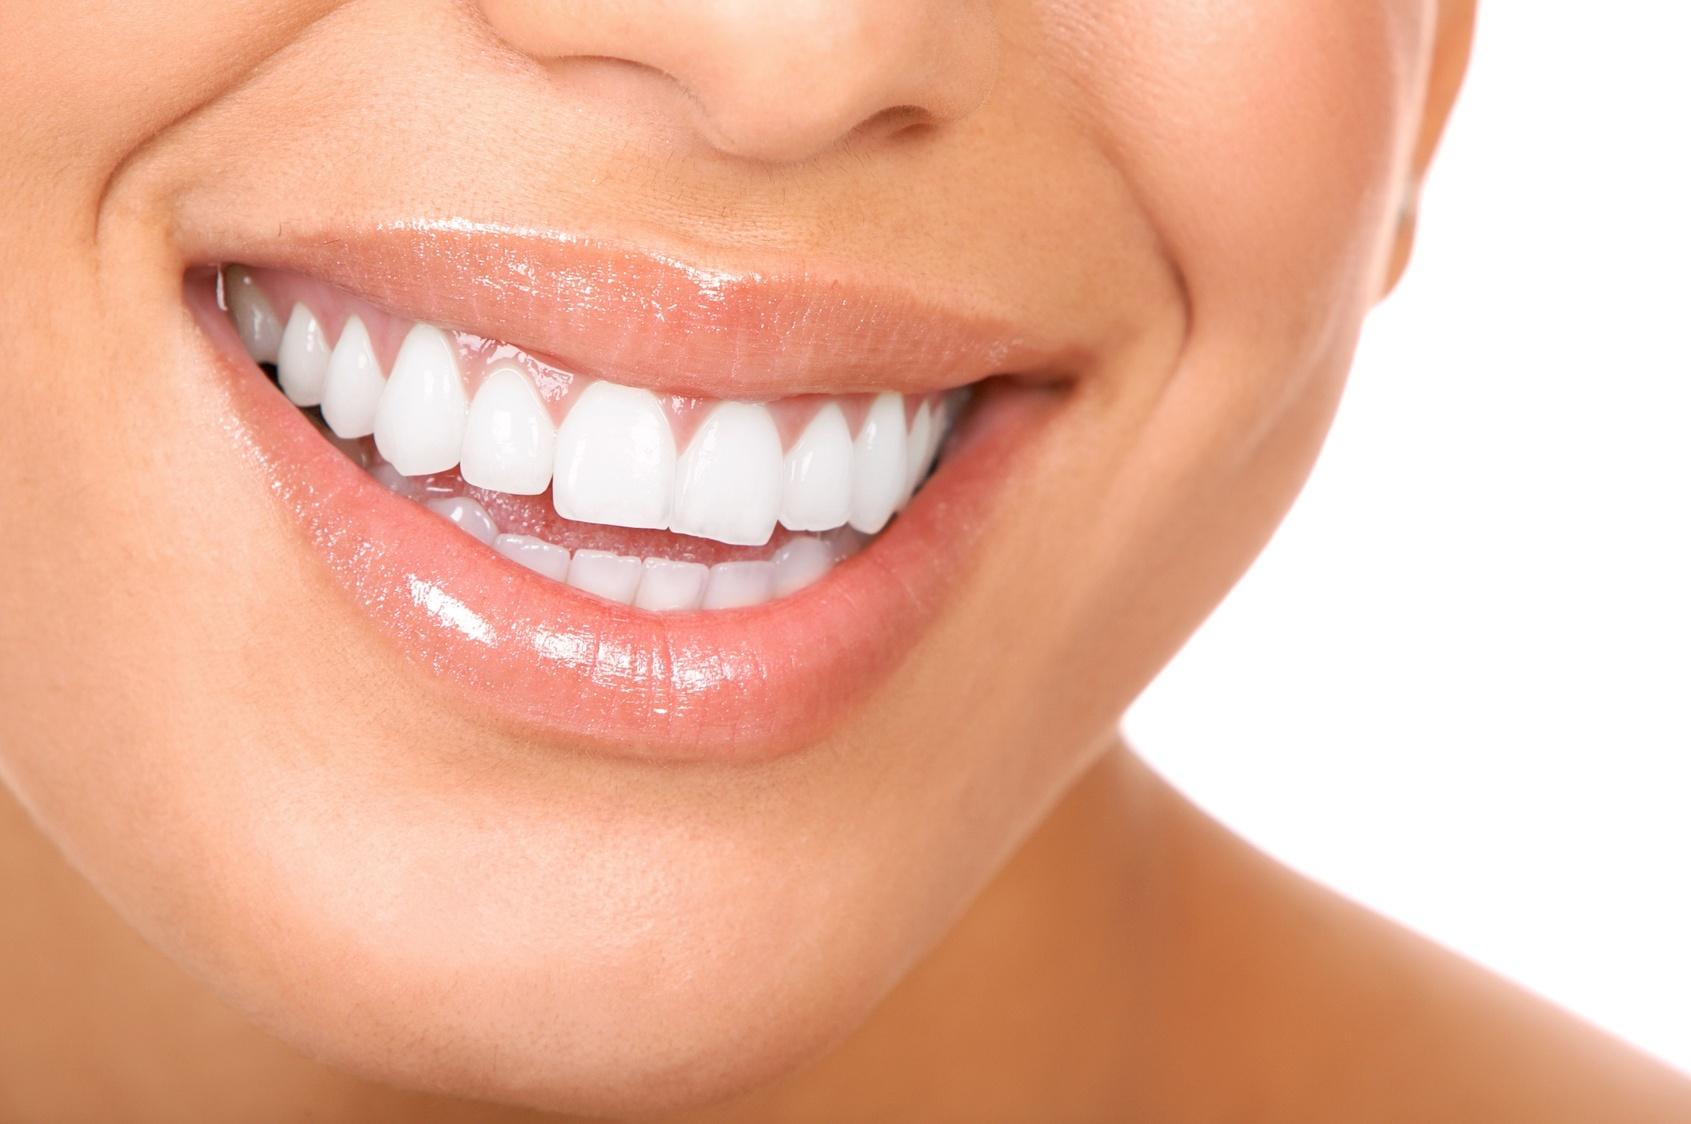 comment blanchir une couronne dentaire